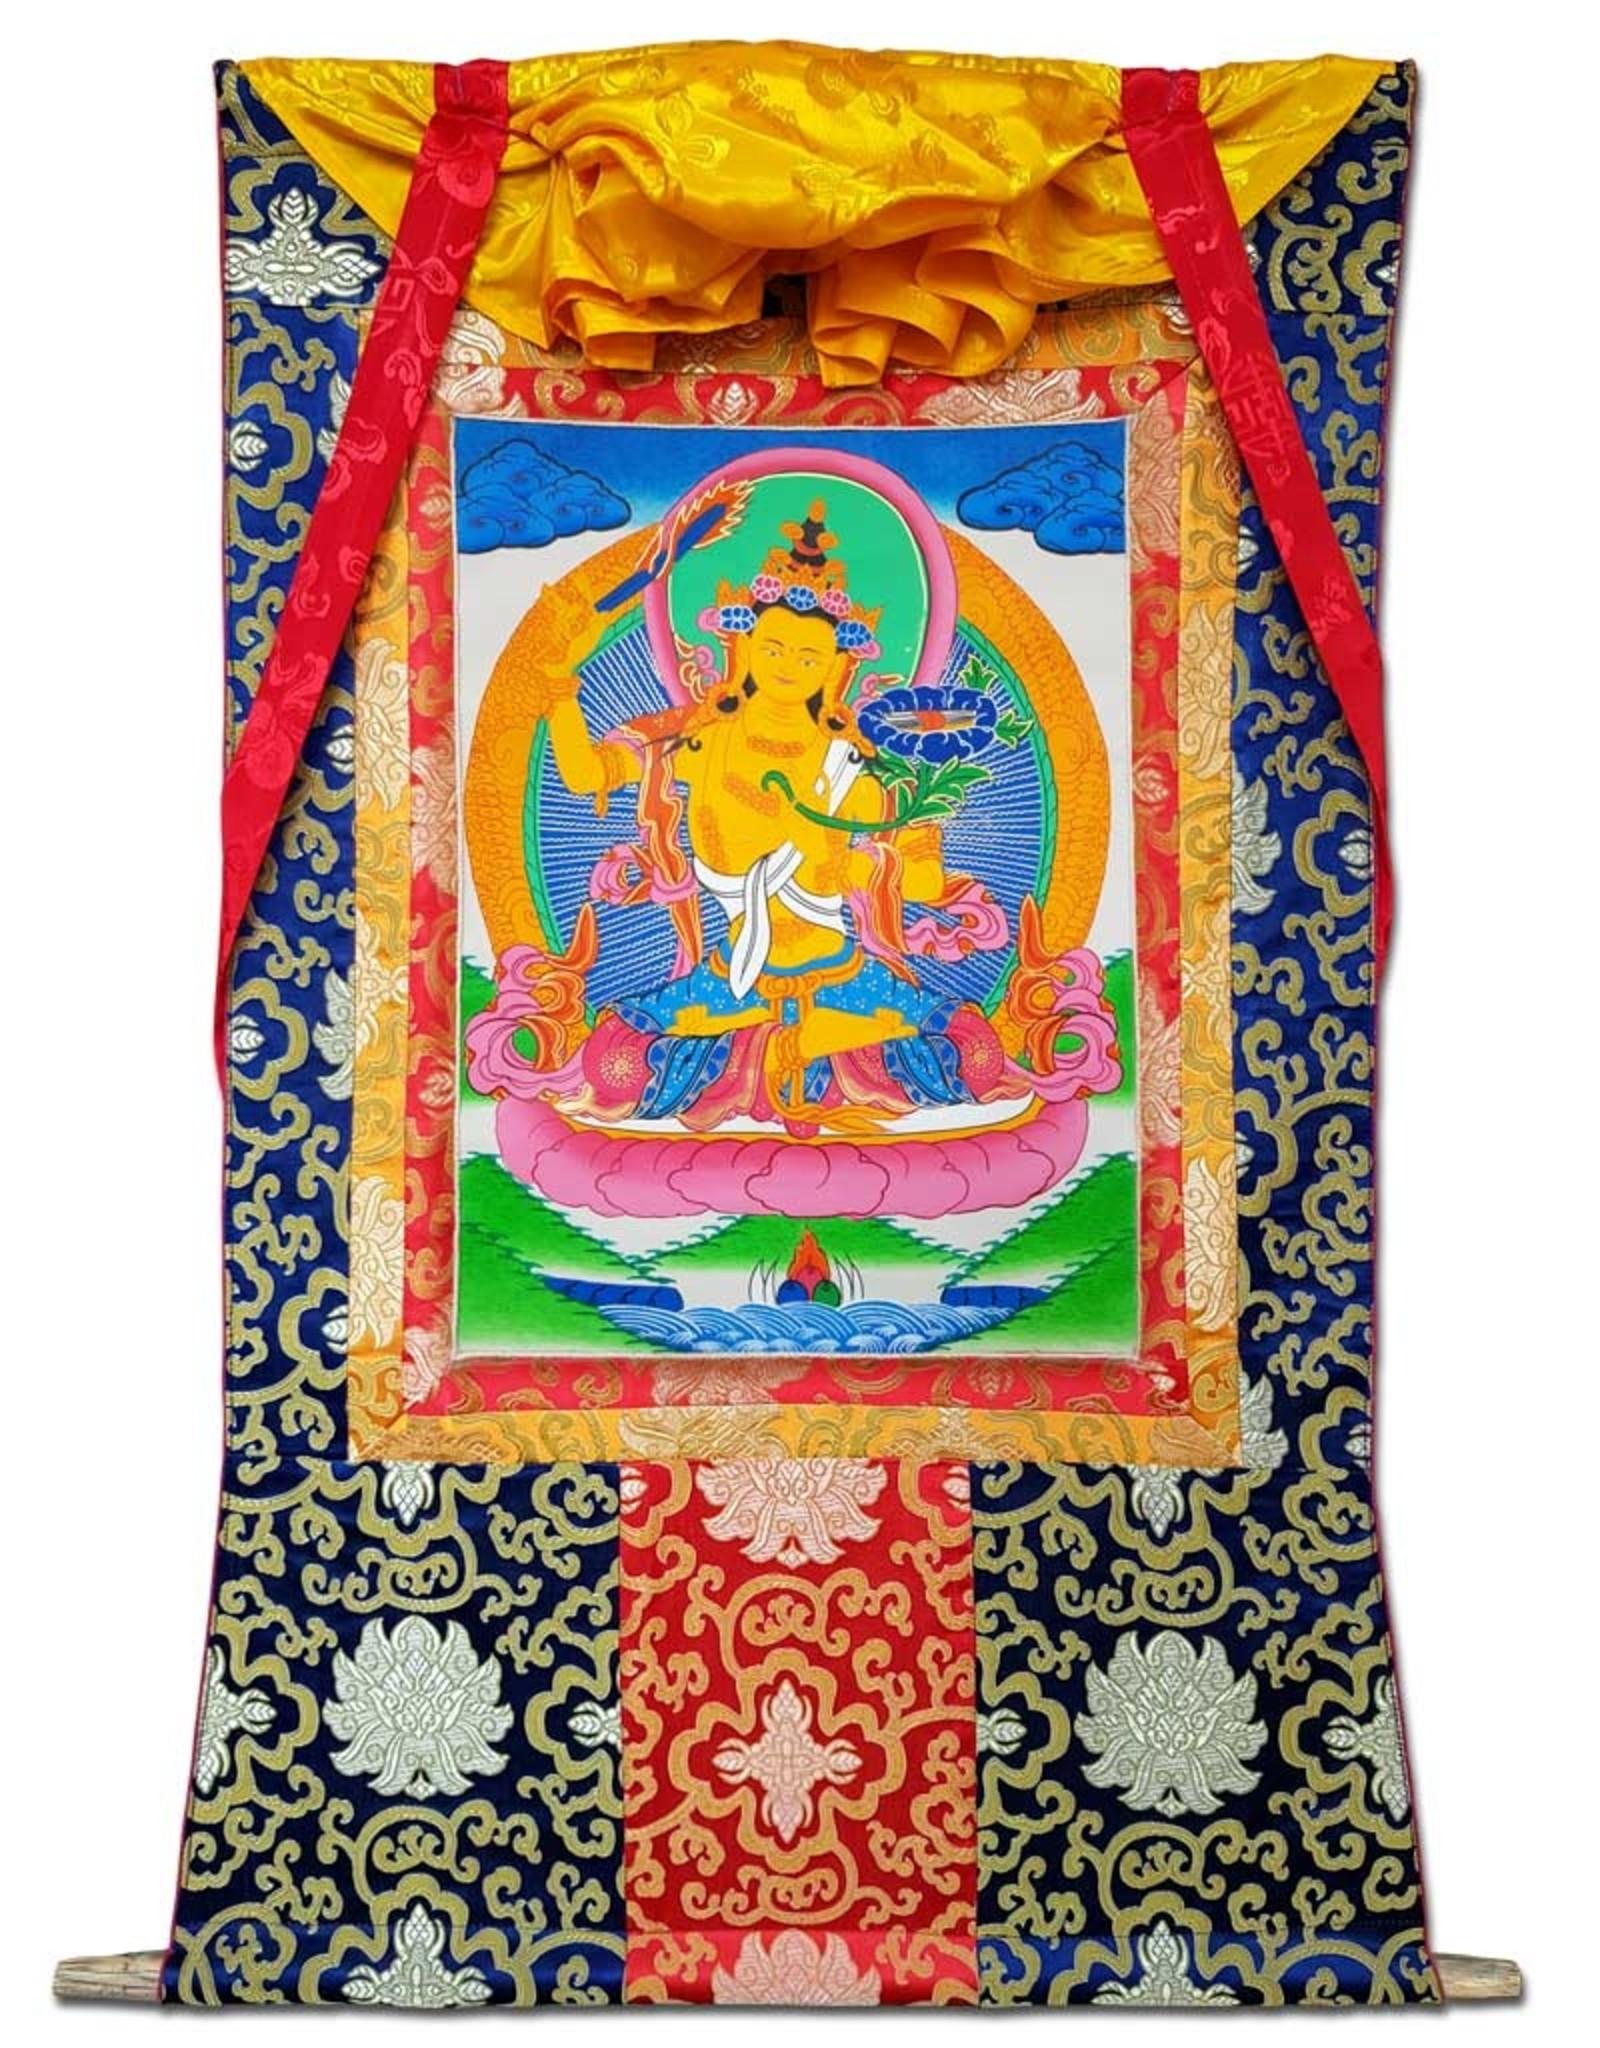 Tibetisches Thangka Jamphel Yang (Mañjushrî)